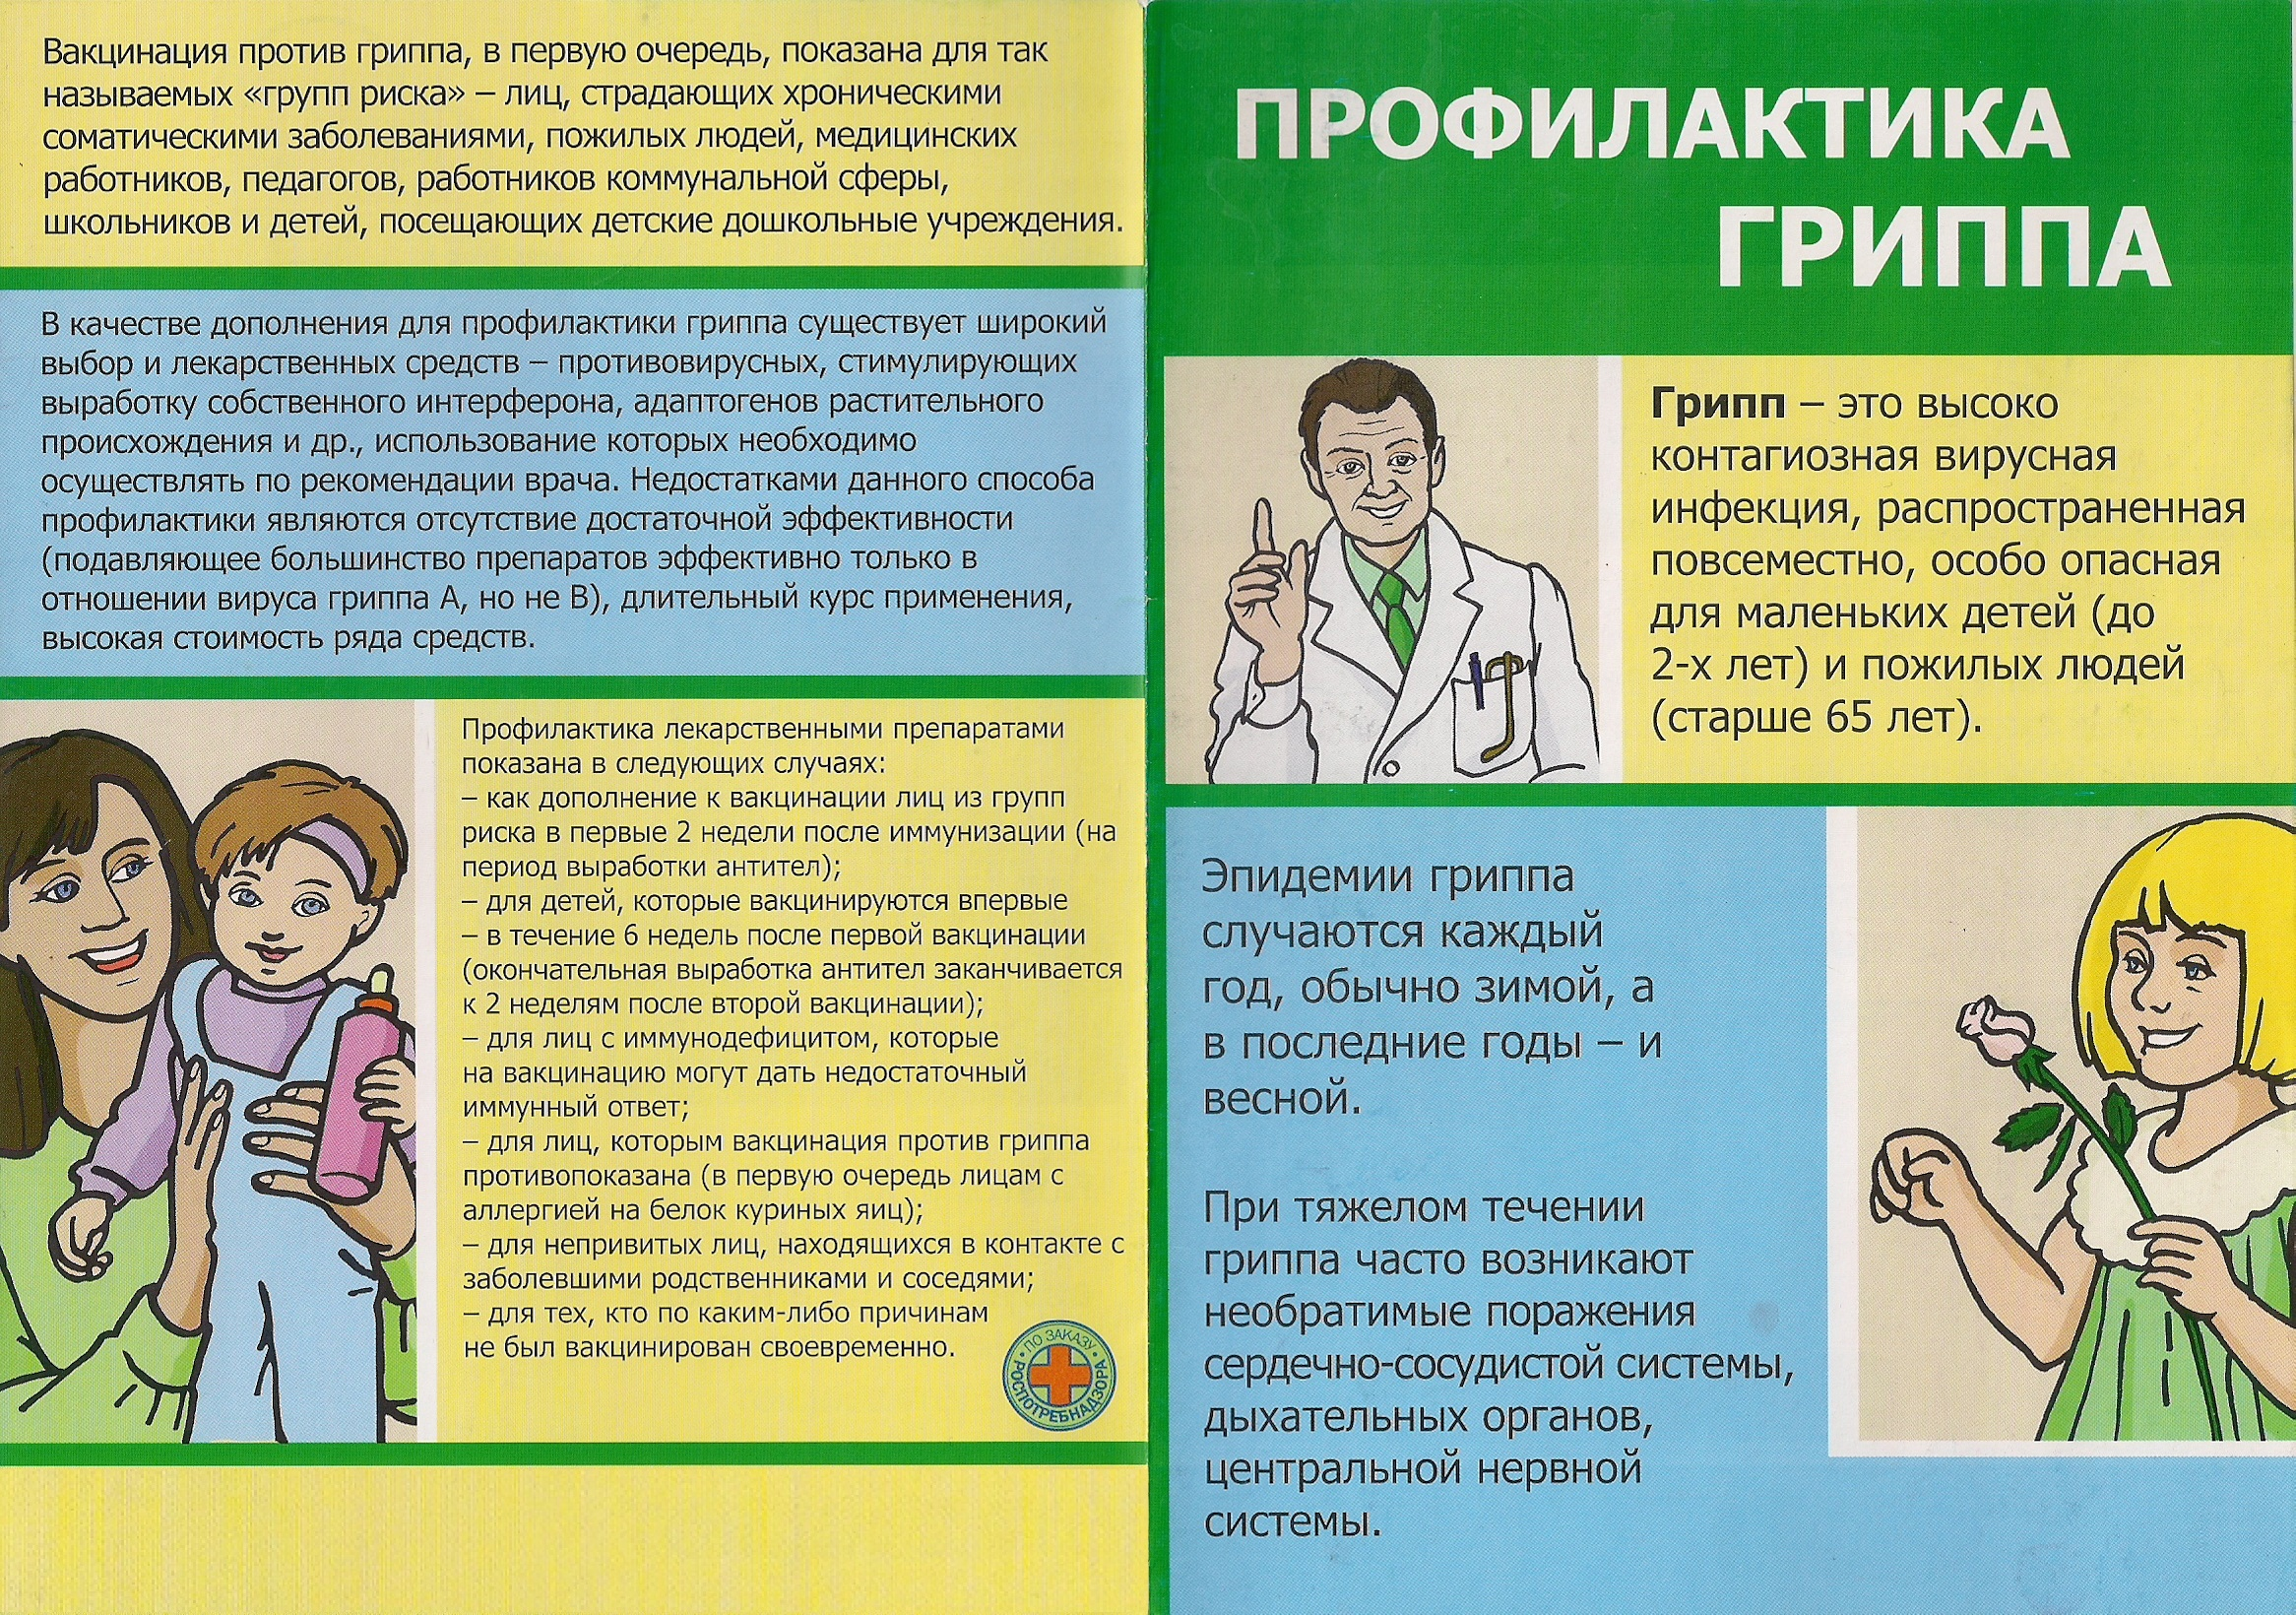 Картинки о прививках о гриппе